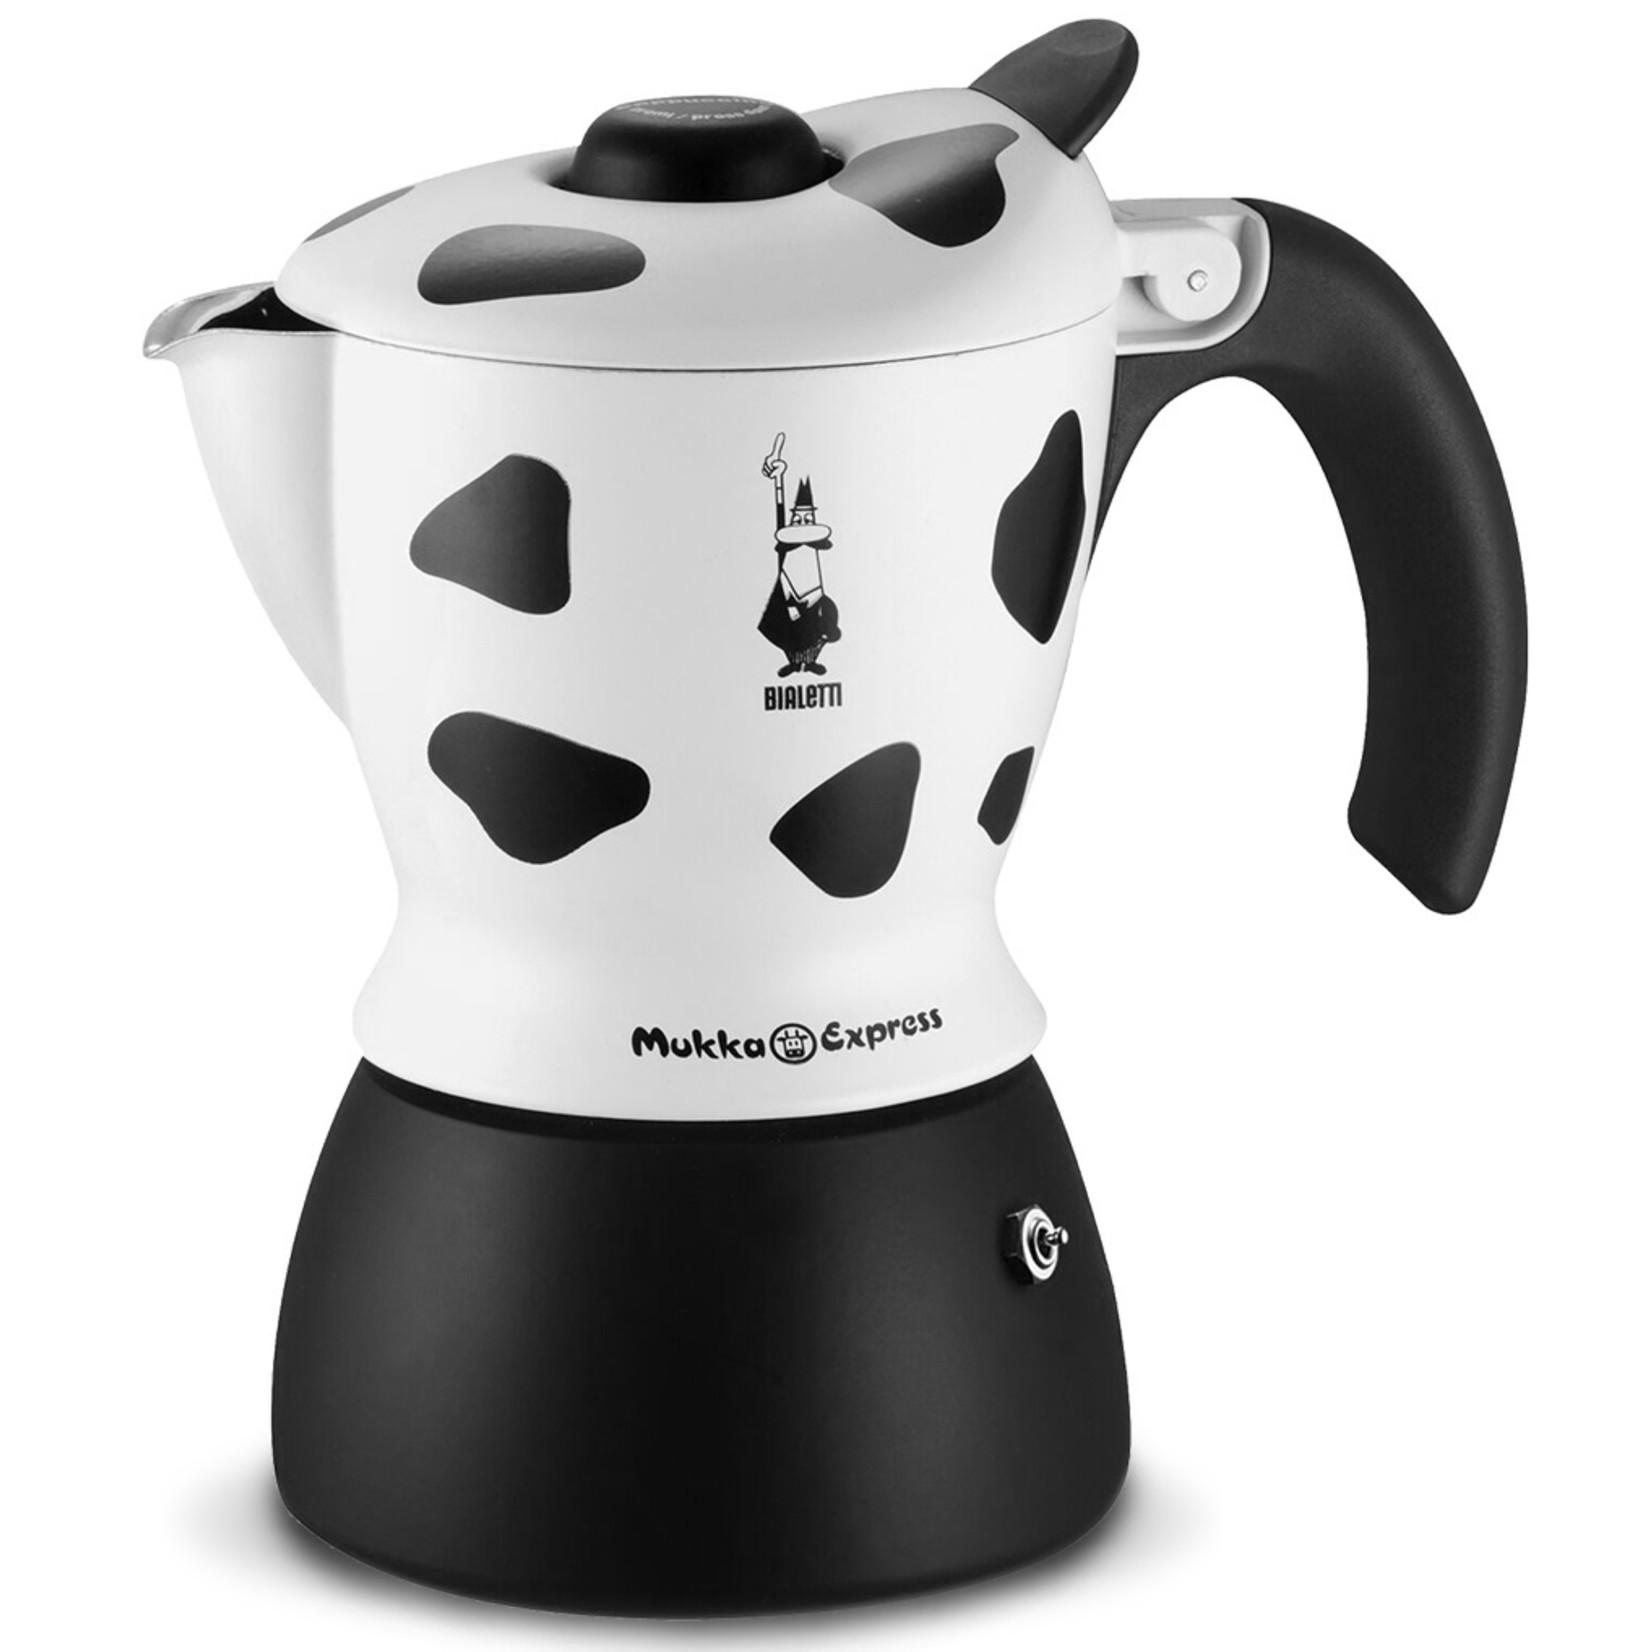 Bialetti Bialetti Mukka Express 2 kops cappuccino maker